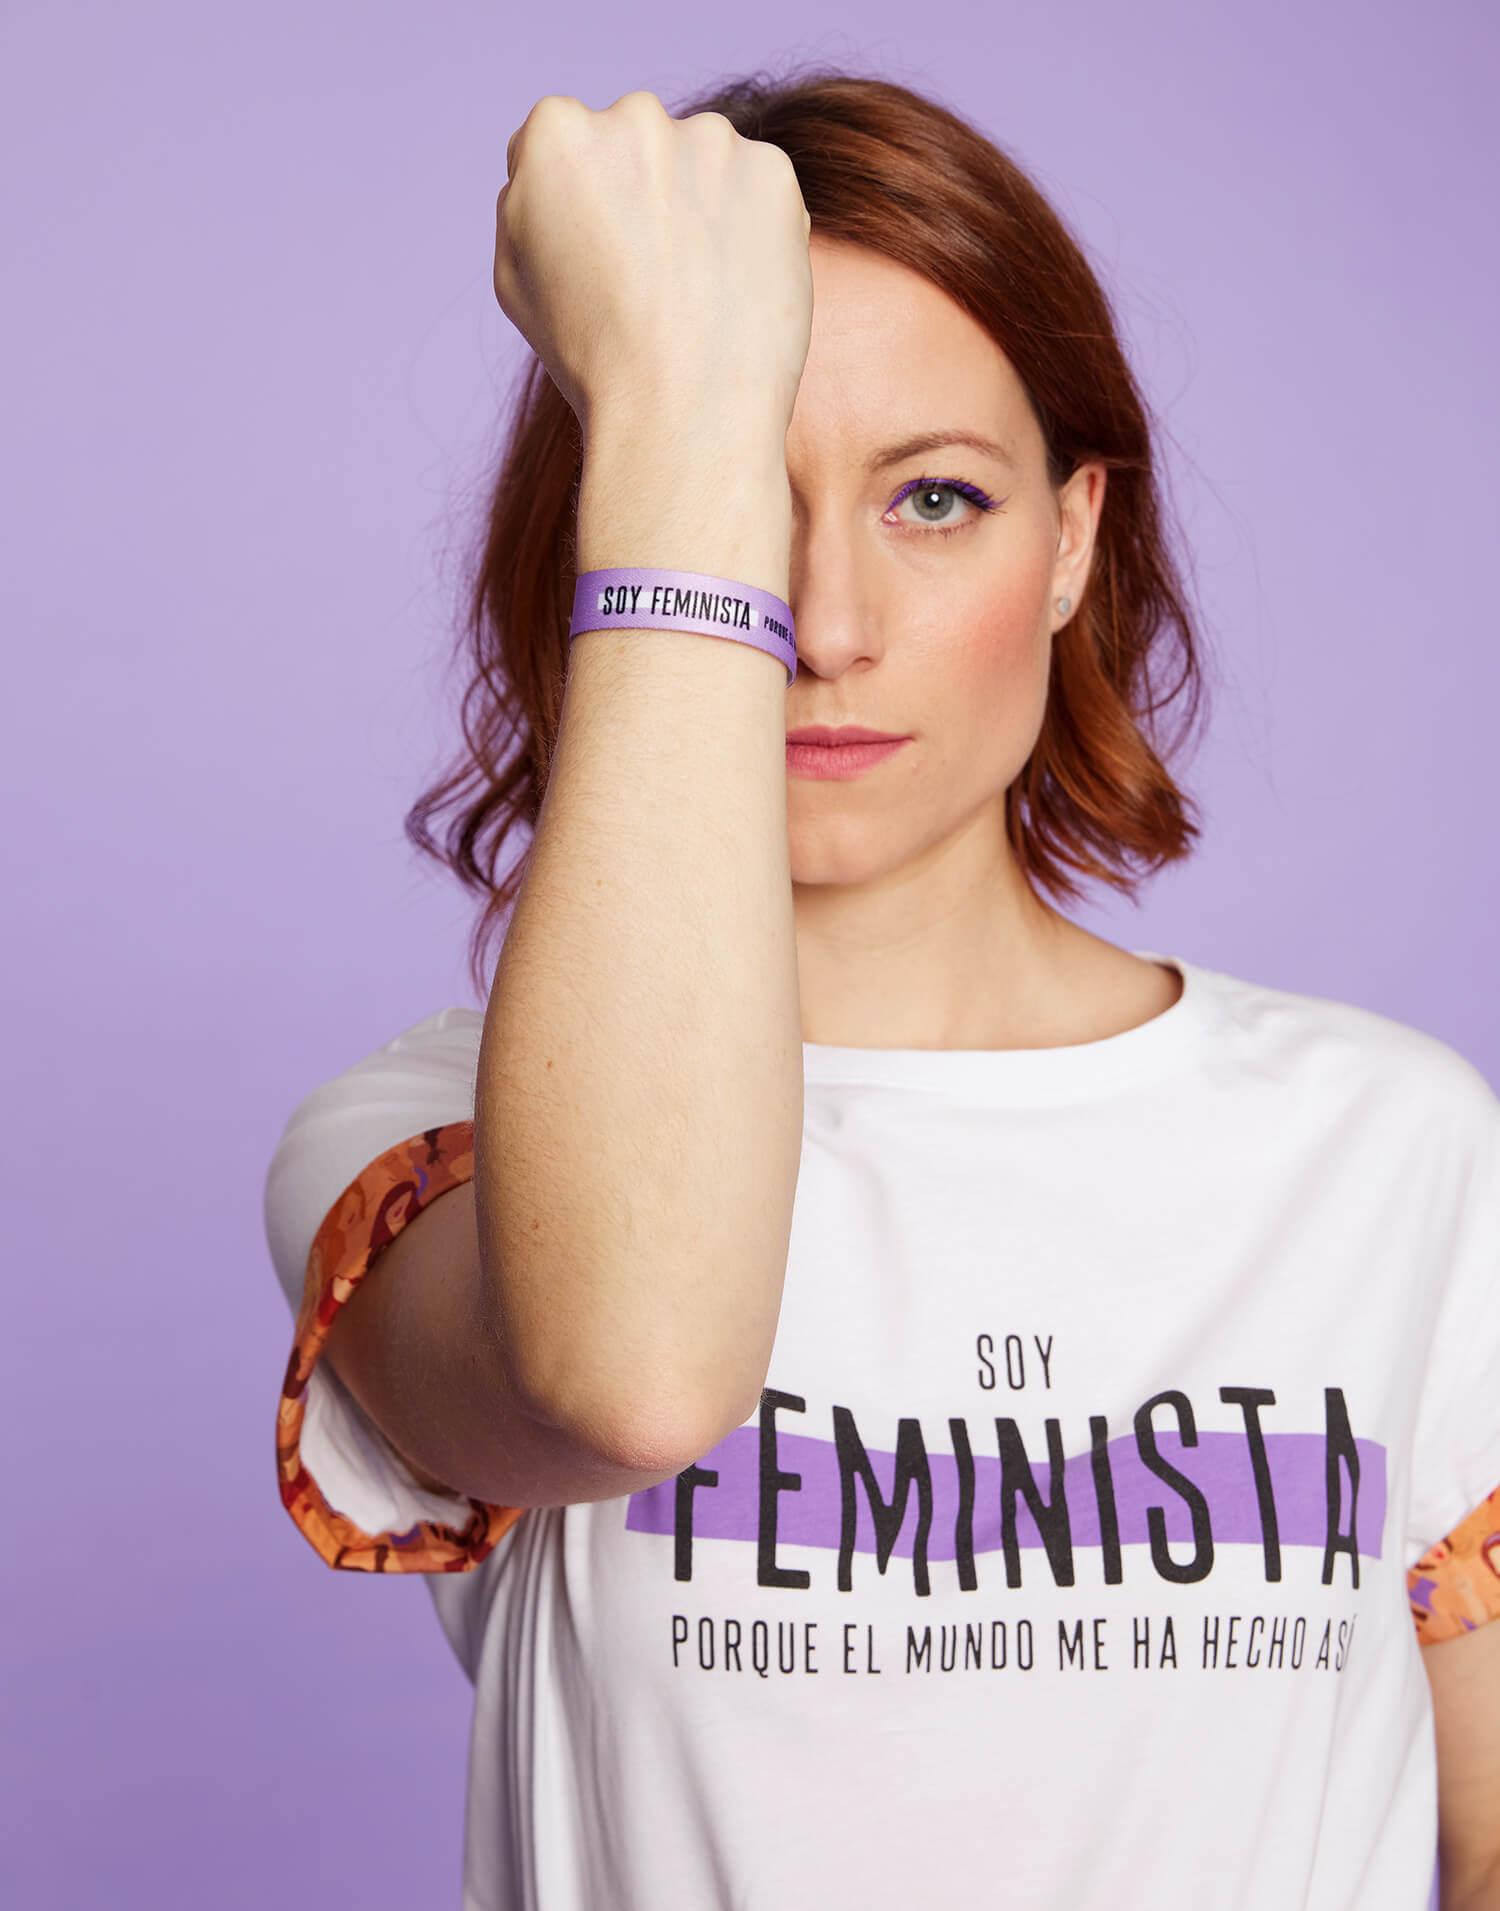 Pulsera 'Soy Feminista' 2020